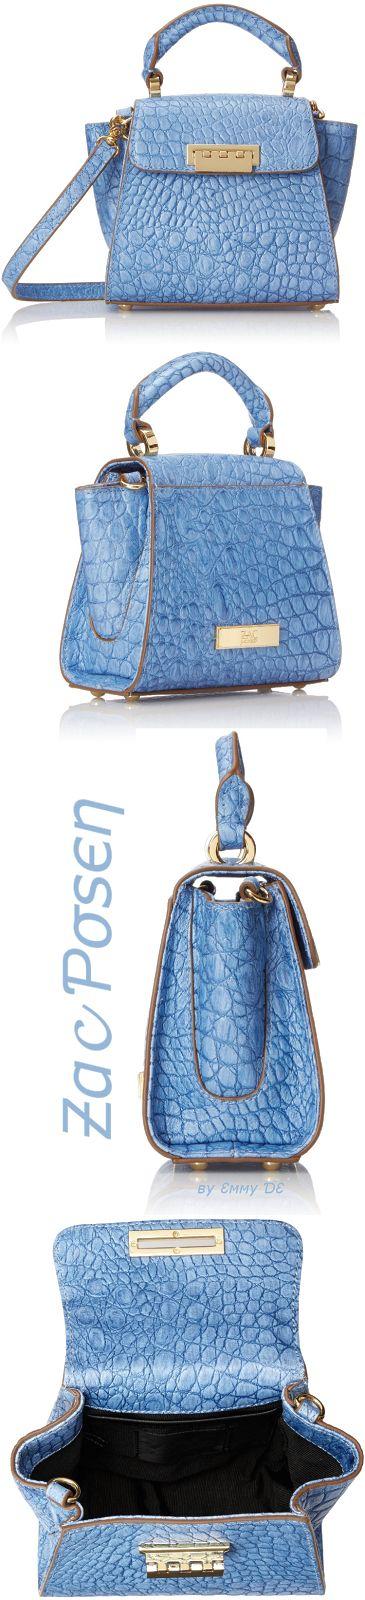 Brilliant Luxury by Emmy DE * Zac Posen 'Eartha' Mini Top Handle Bag 2015